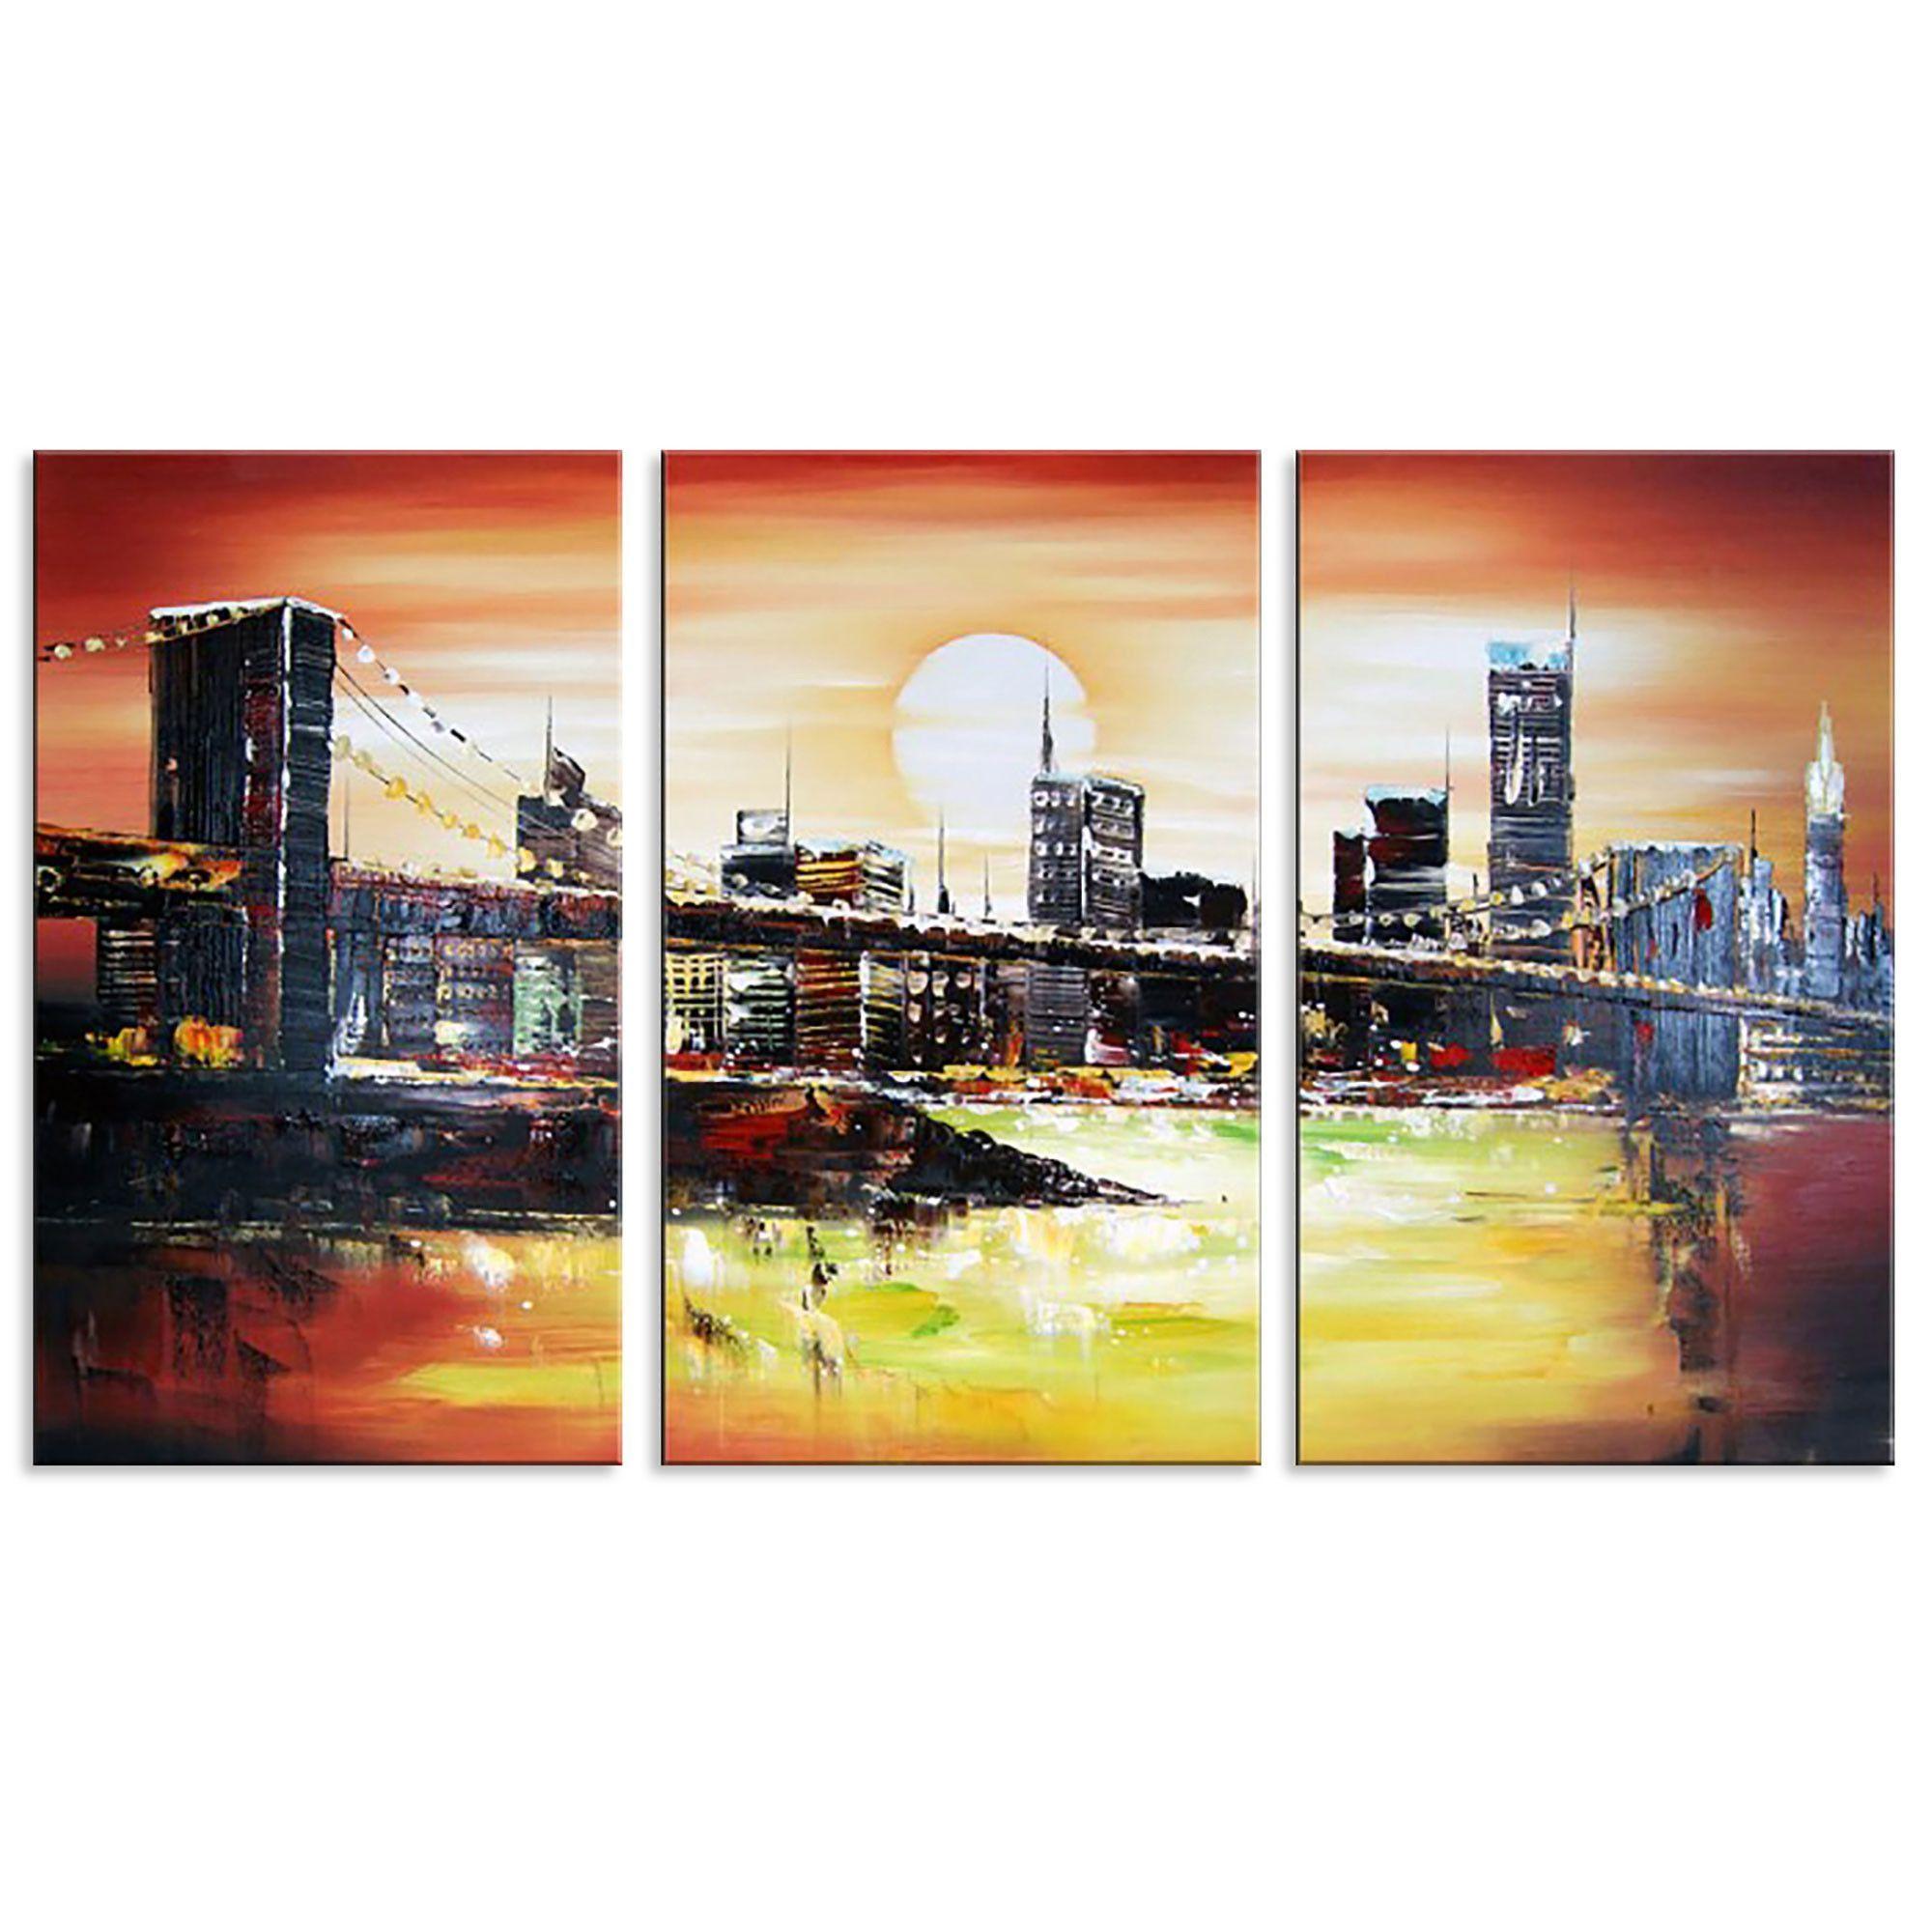 Aliexpress Com Buy 3 Pieces Wall Art New York City: Famous New York City Bridge Cityscape Canvas Wall Art Oil